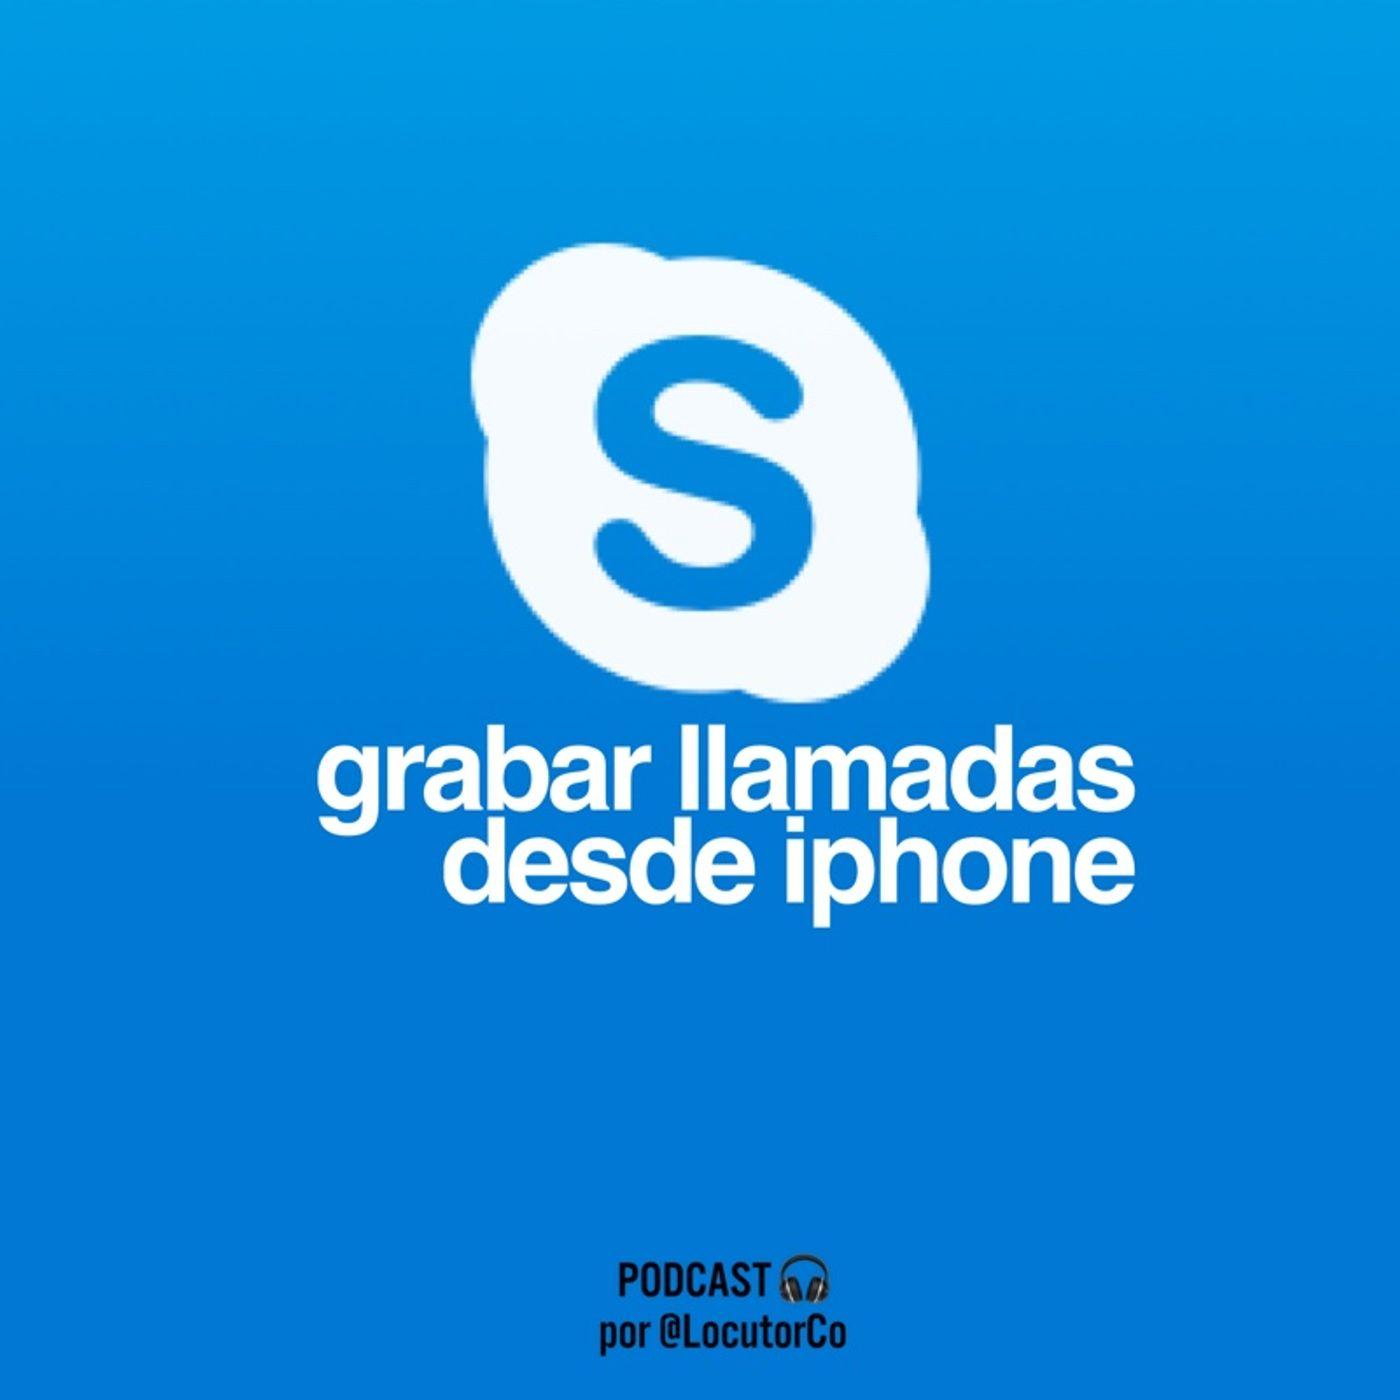 Grabar llamadas en iPhone con Skype